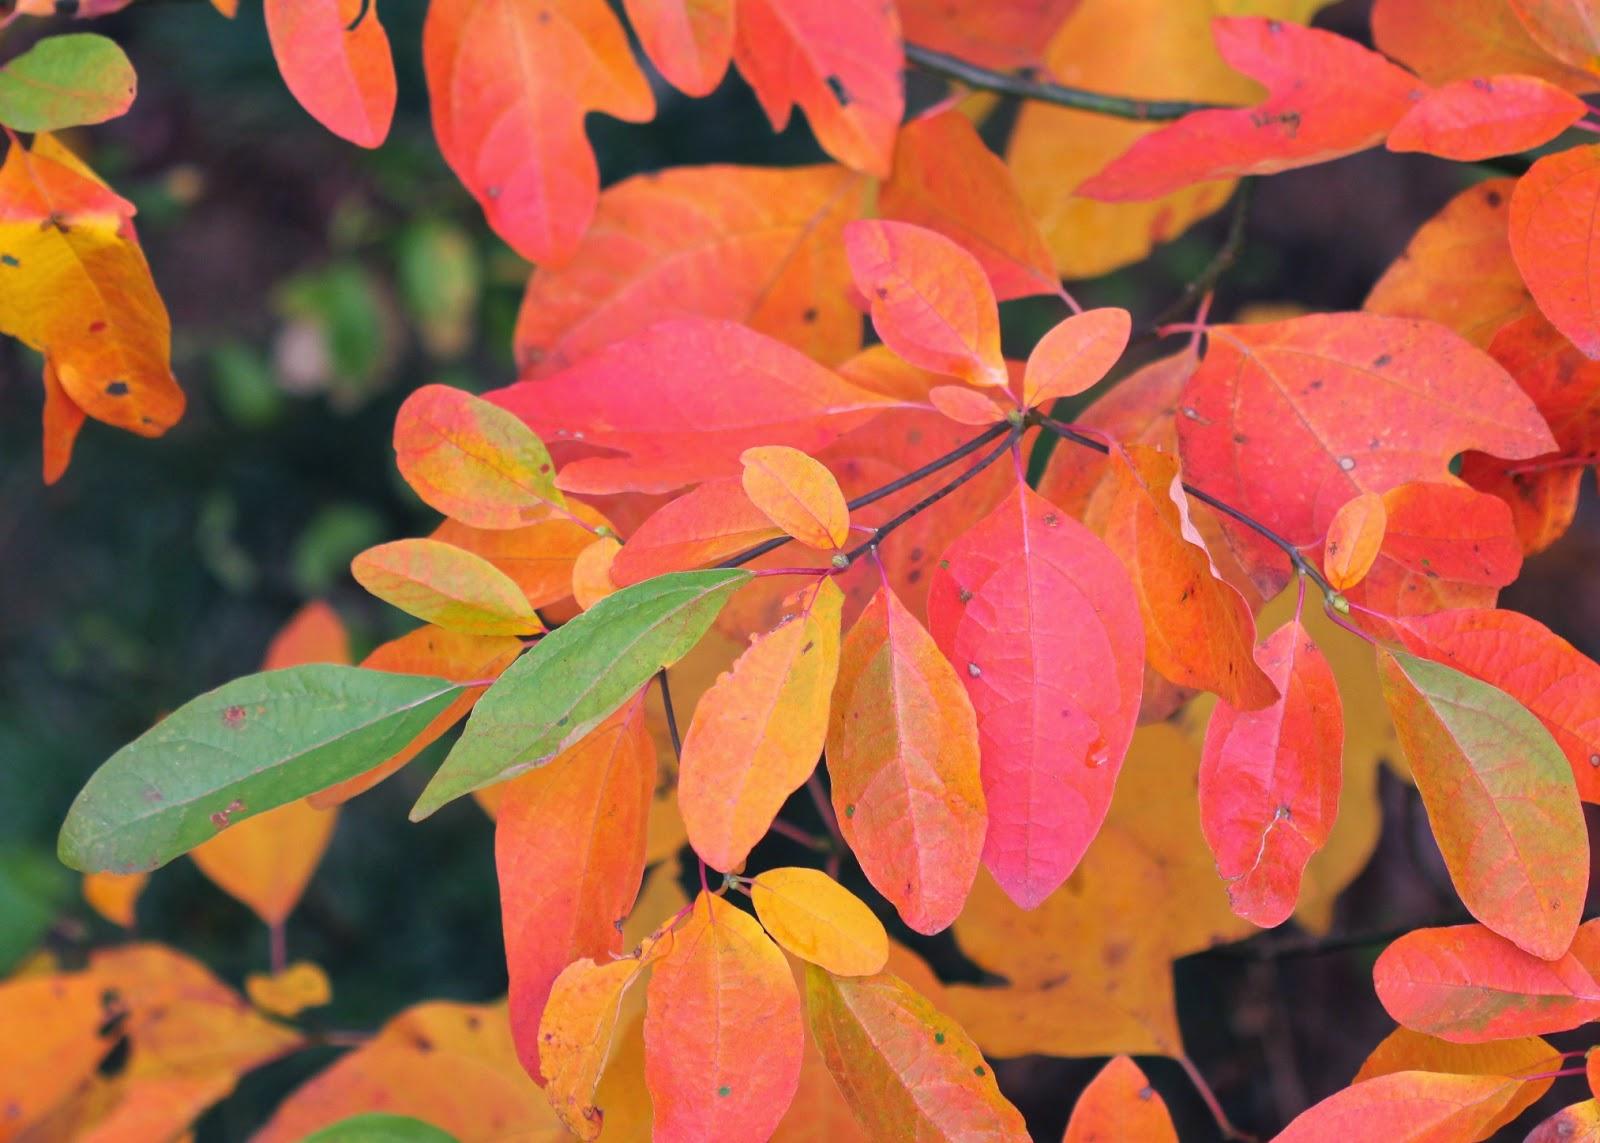 Red House Garden: Four Seasons of Sassafras